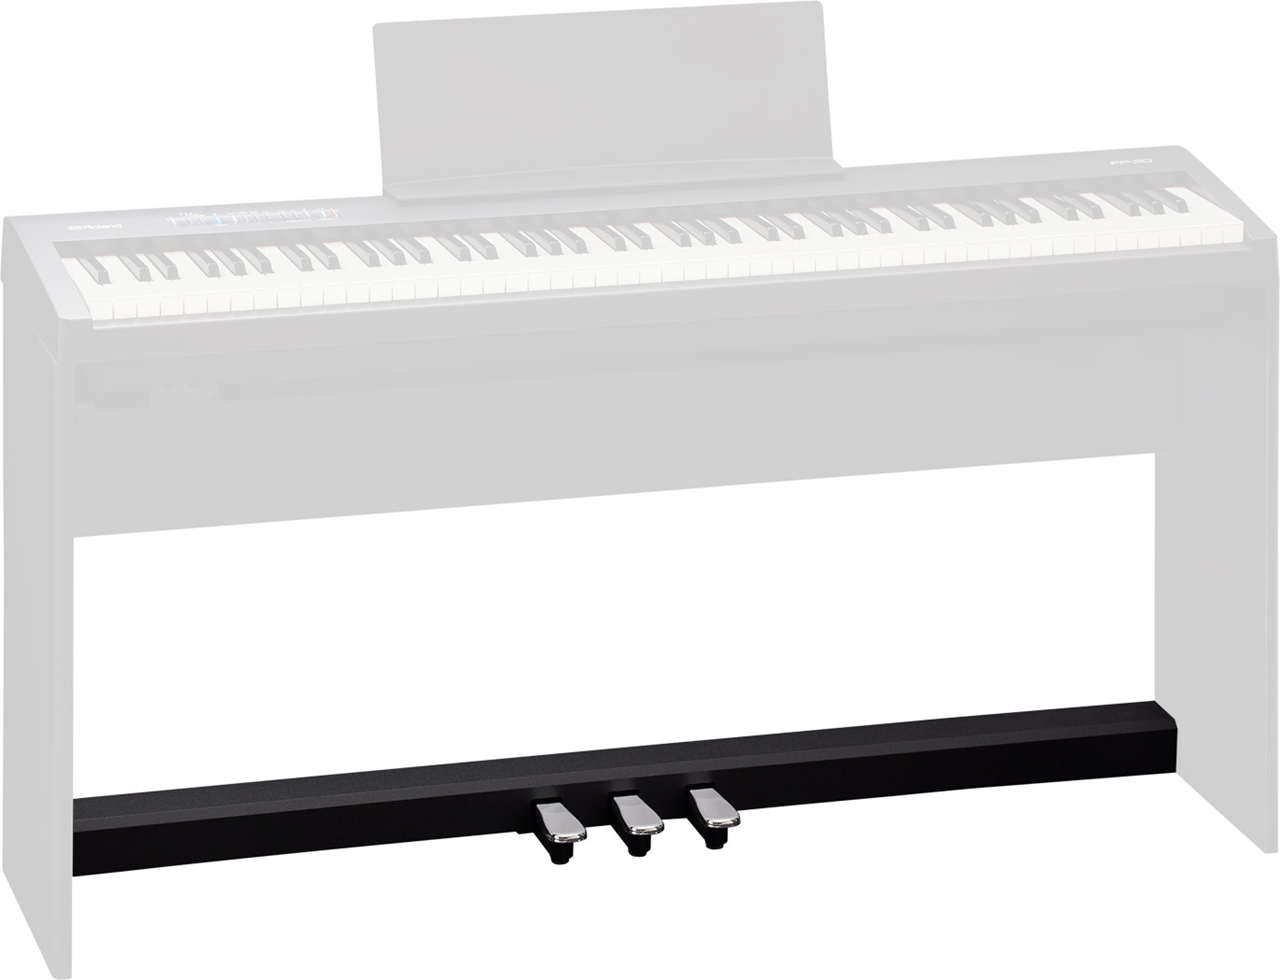 Roland Kpd 70 Black Pedal Unit For Fp 30 Digital Piano Paul Bothner Music Musical Instrument Stores